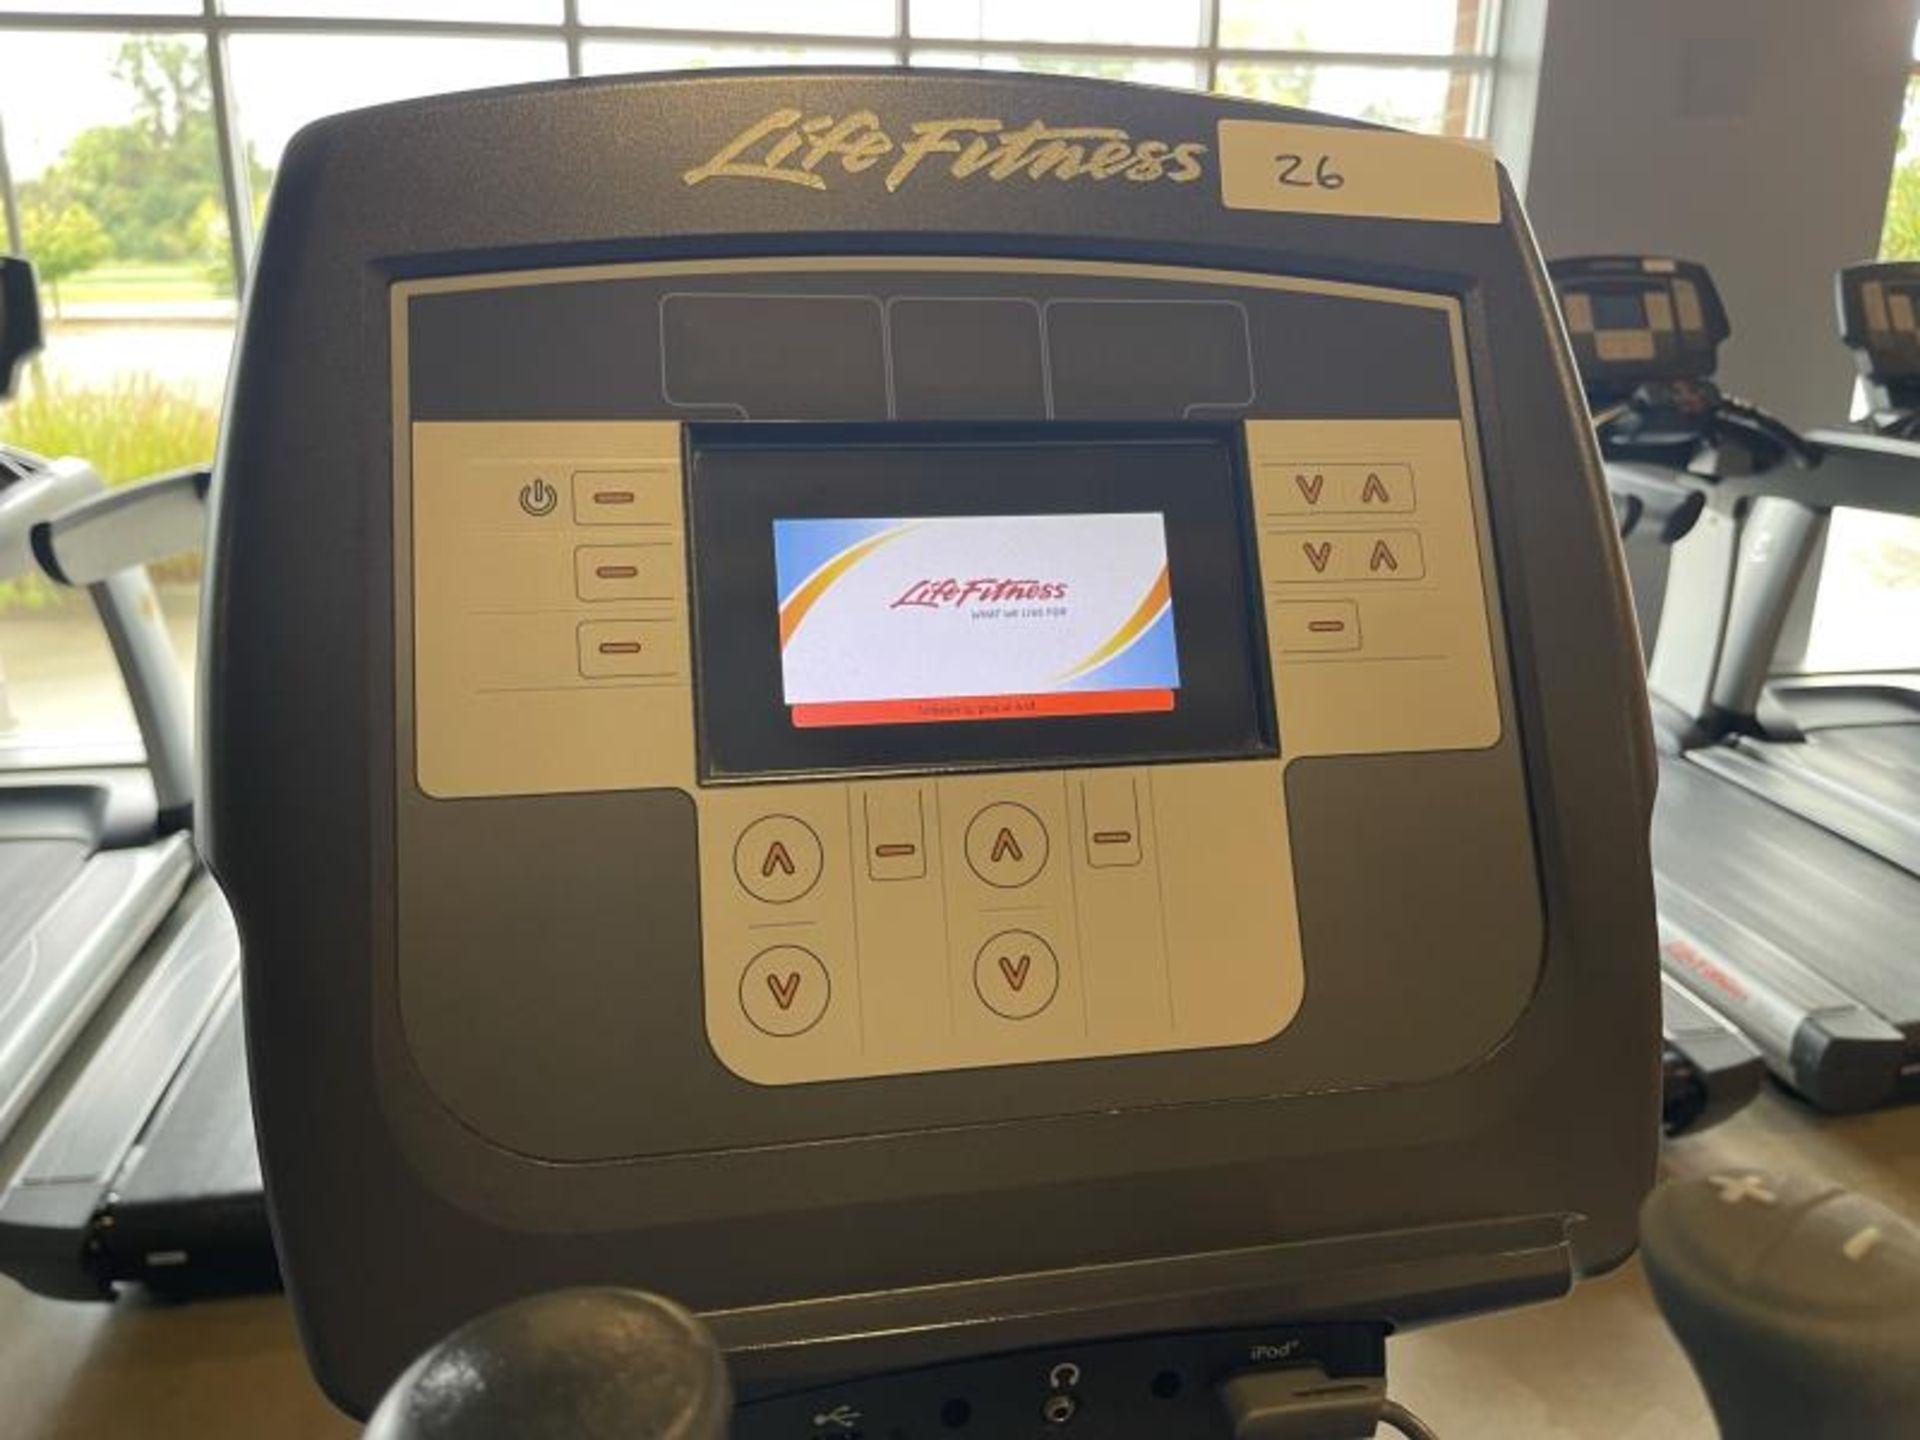 Life Fitness Elliptical M: 95X - Image 3 of 5